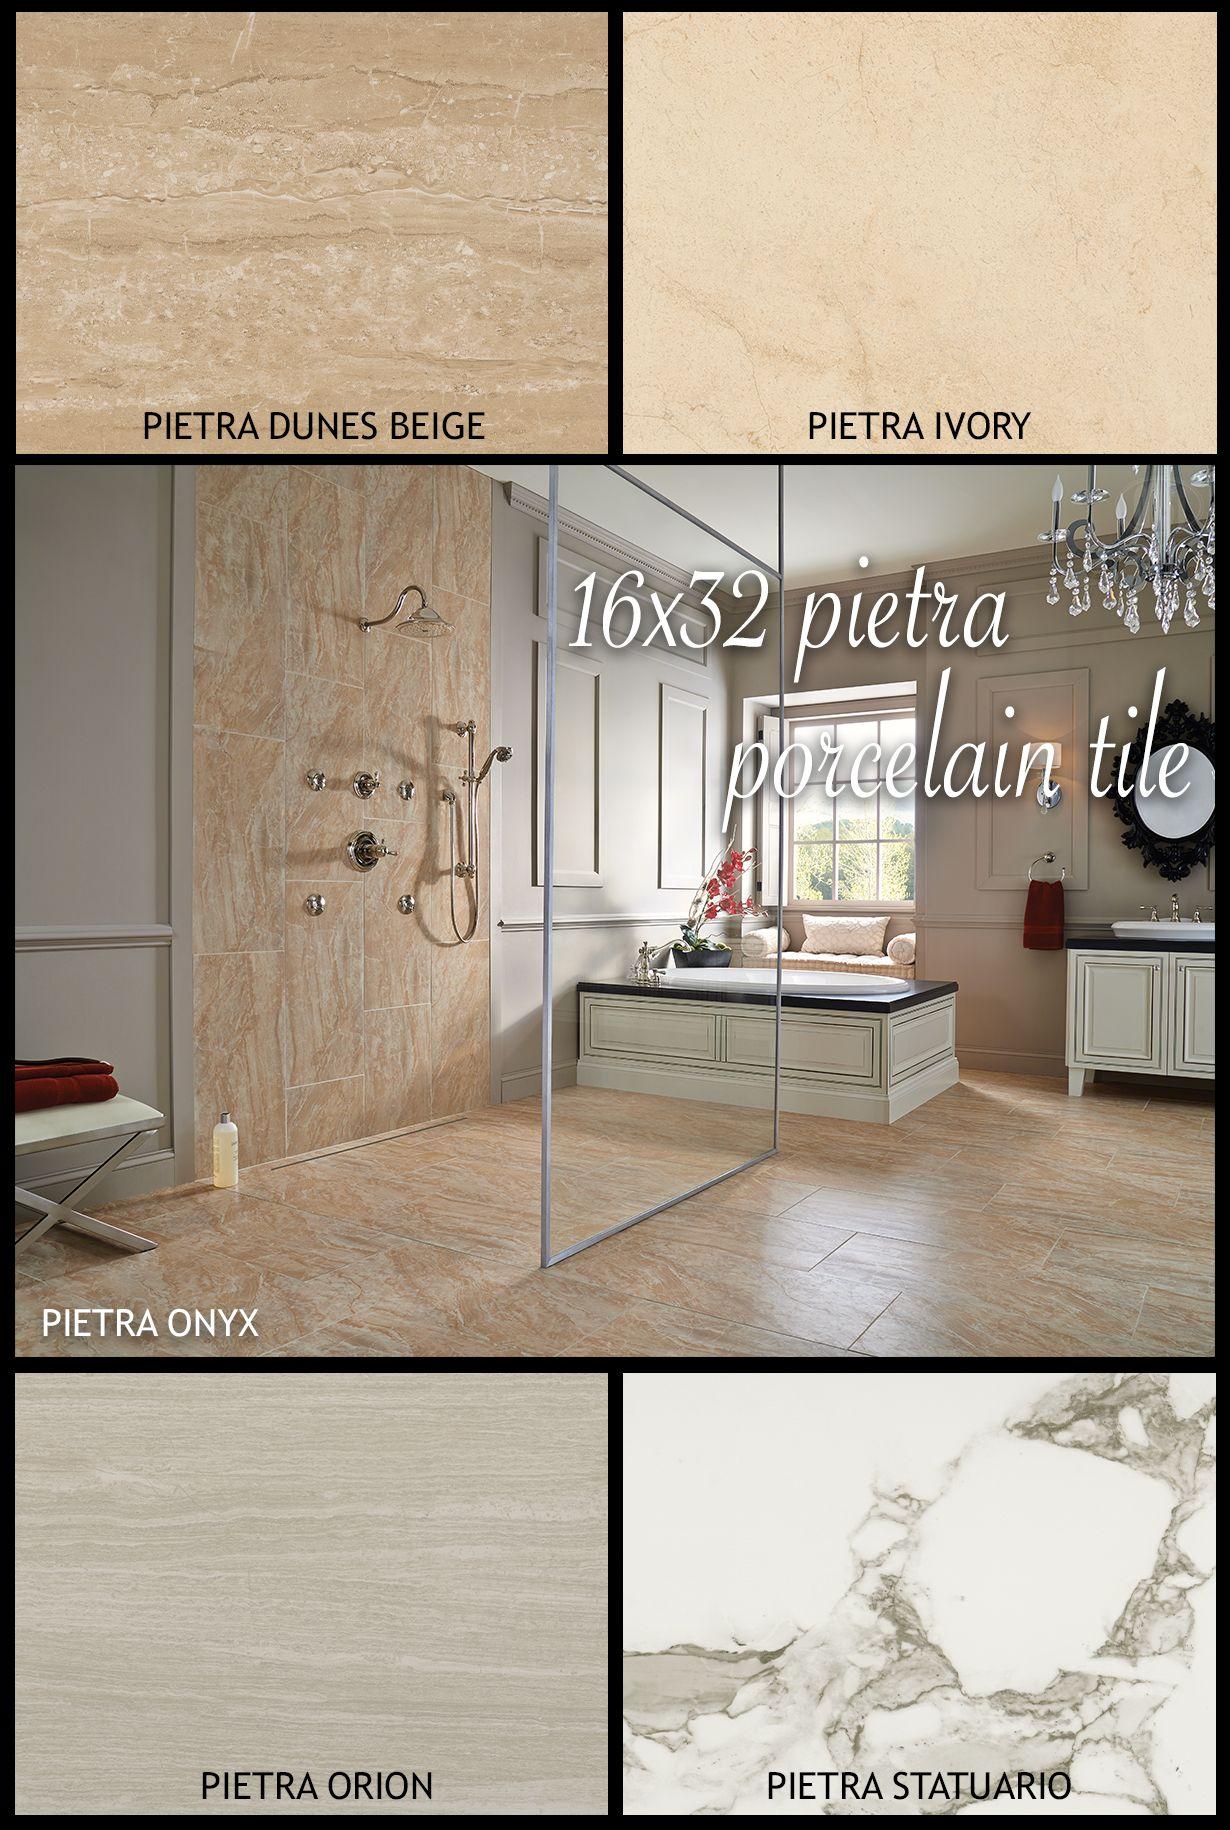 White Hot Trend Large Format Tiles In The Ever Popular Rectangular Format Offer Unique Beauty Fall In Love With Large Format Tile Porcelain Porcelain Tile